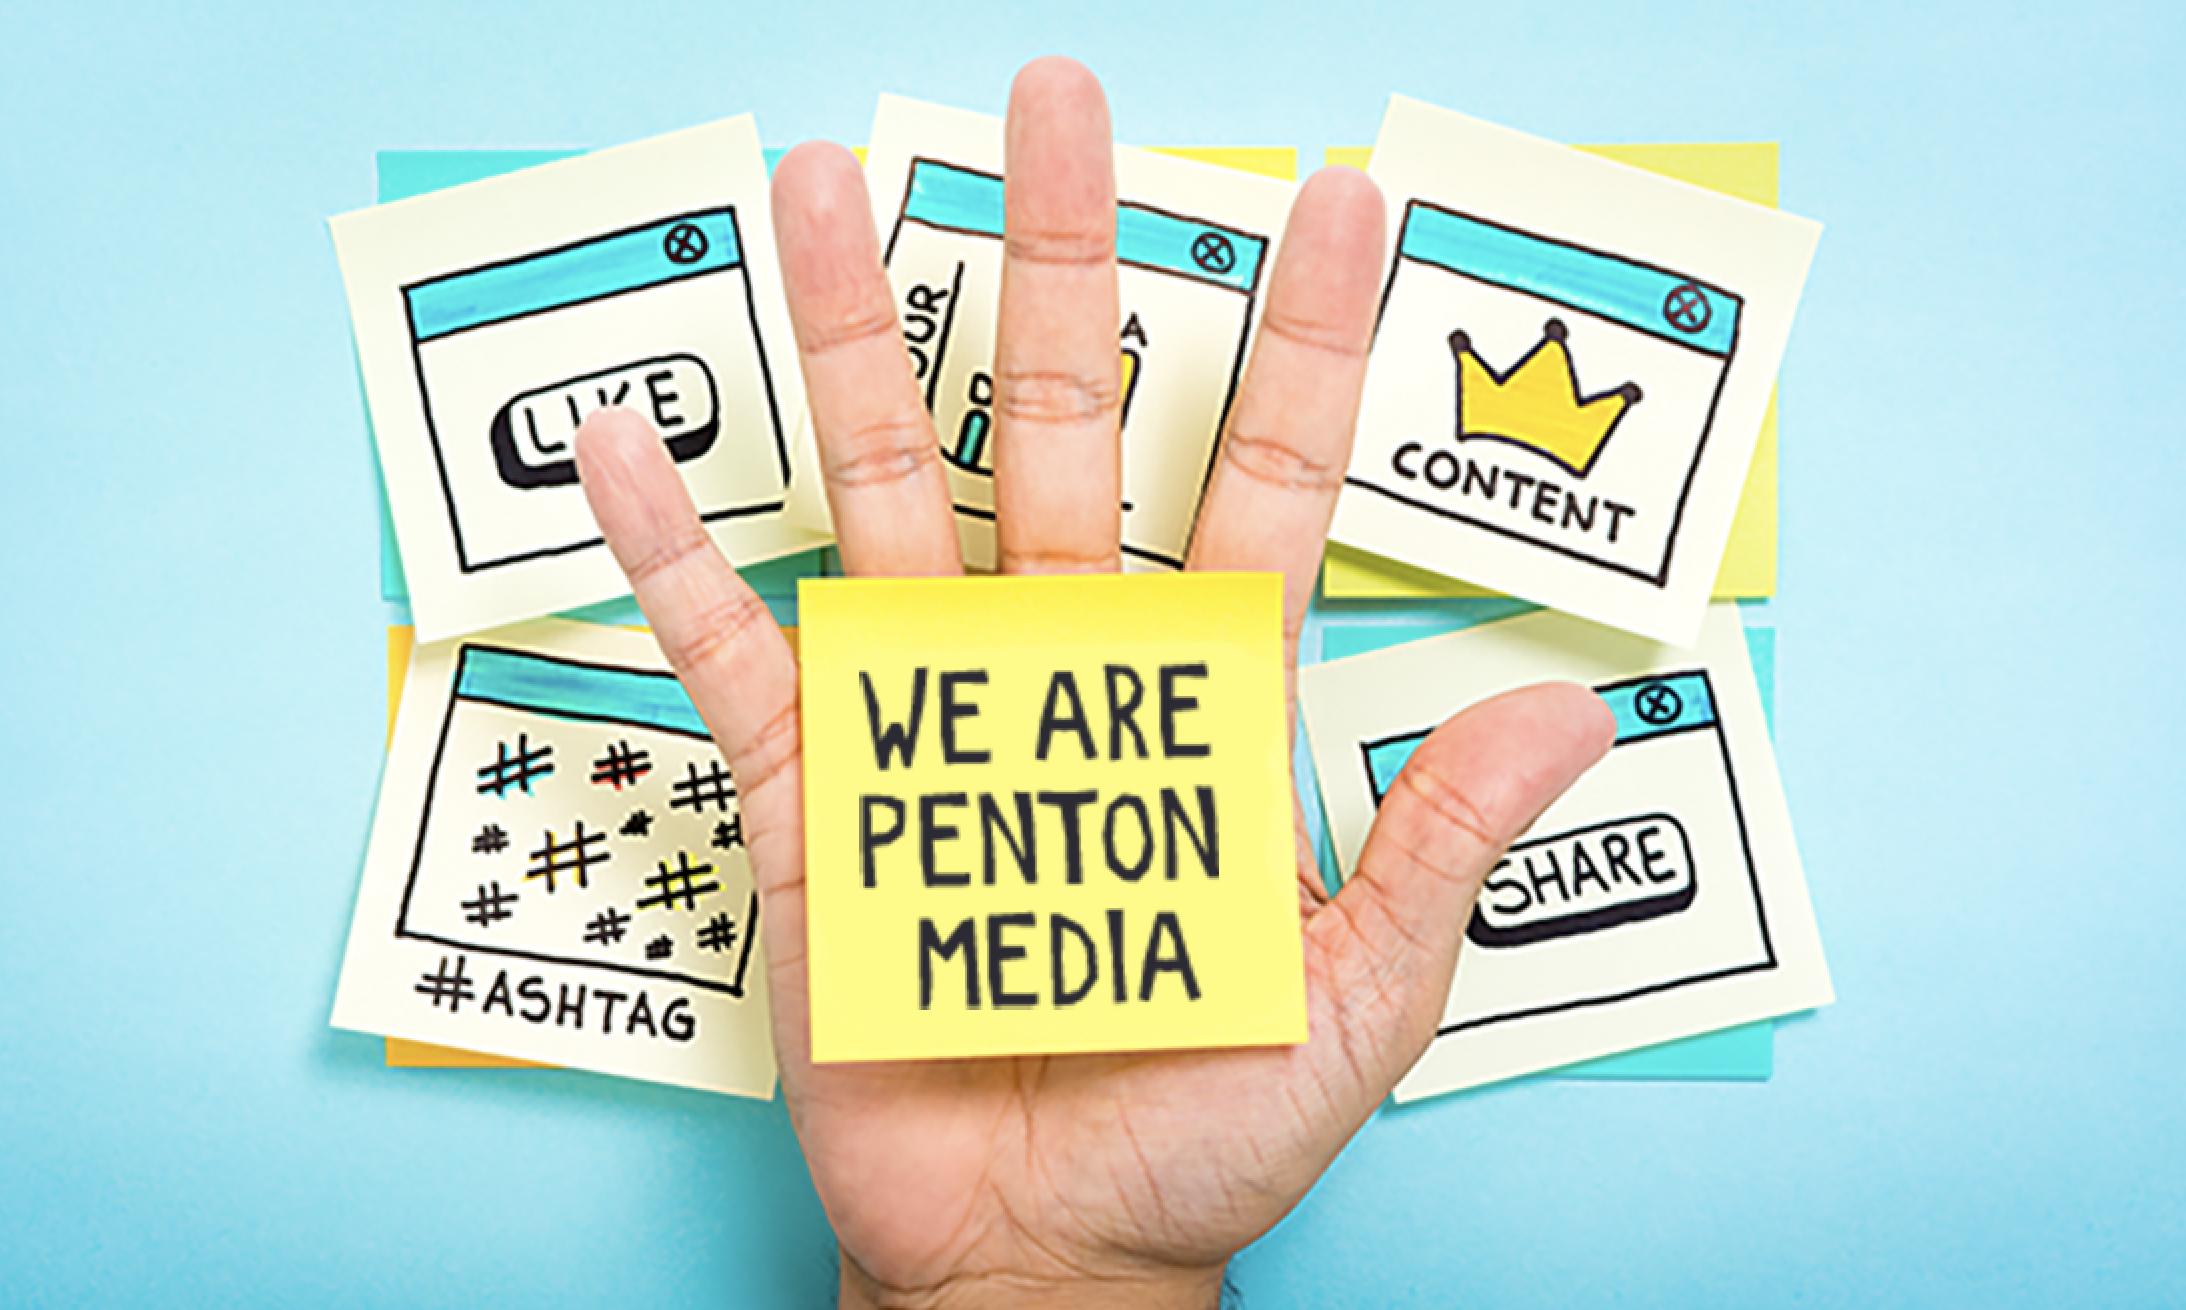 We Are Penton Media Group